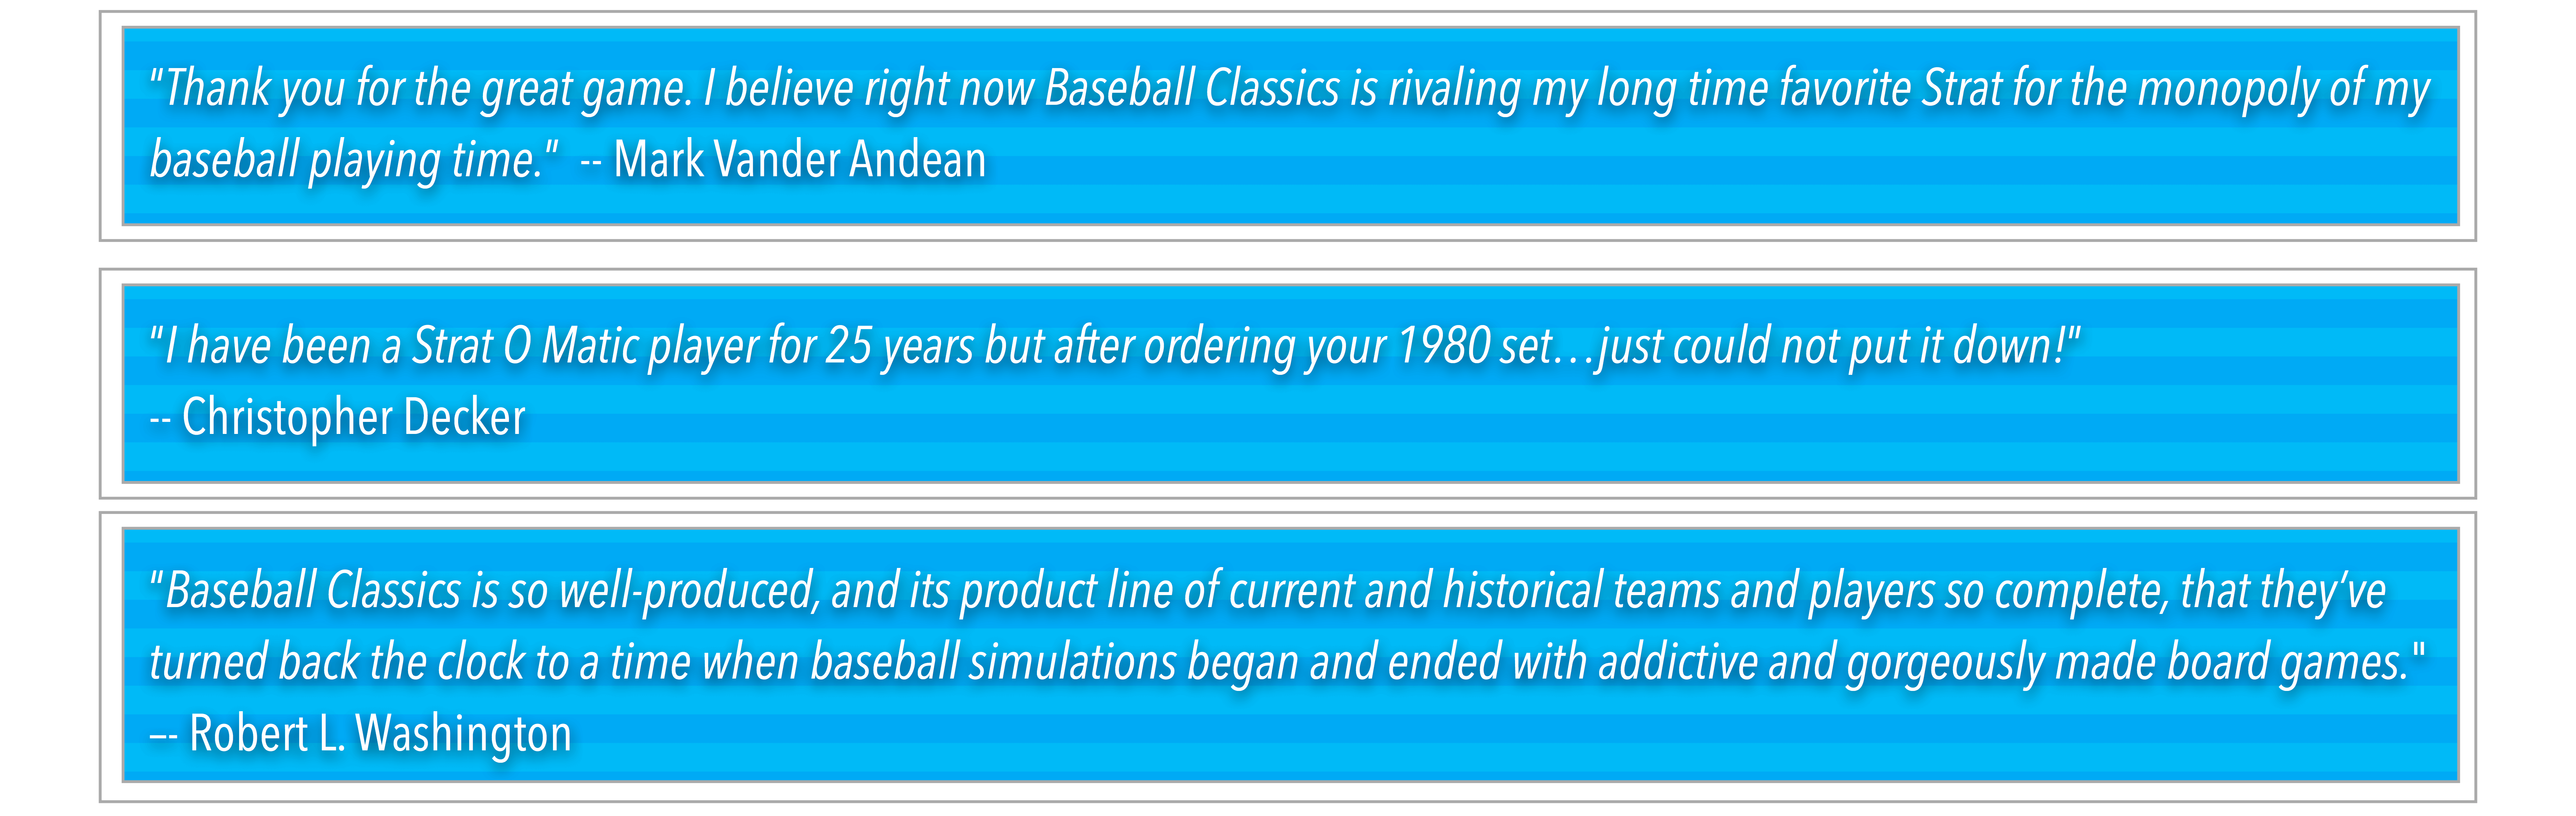 Dollar Baseball Club Baseball Classics Testimonials